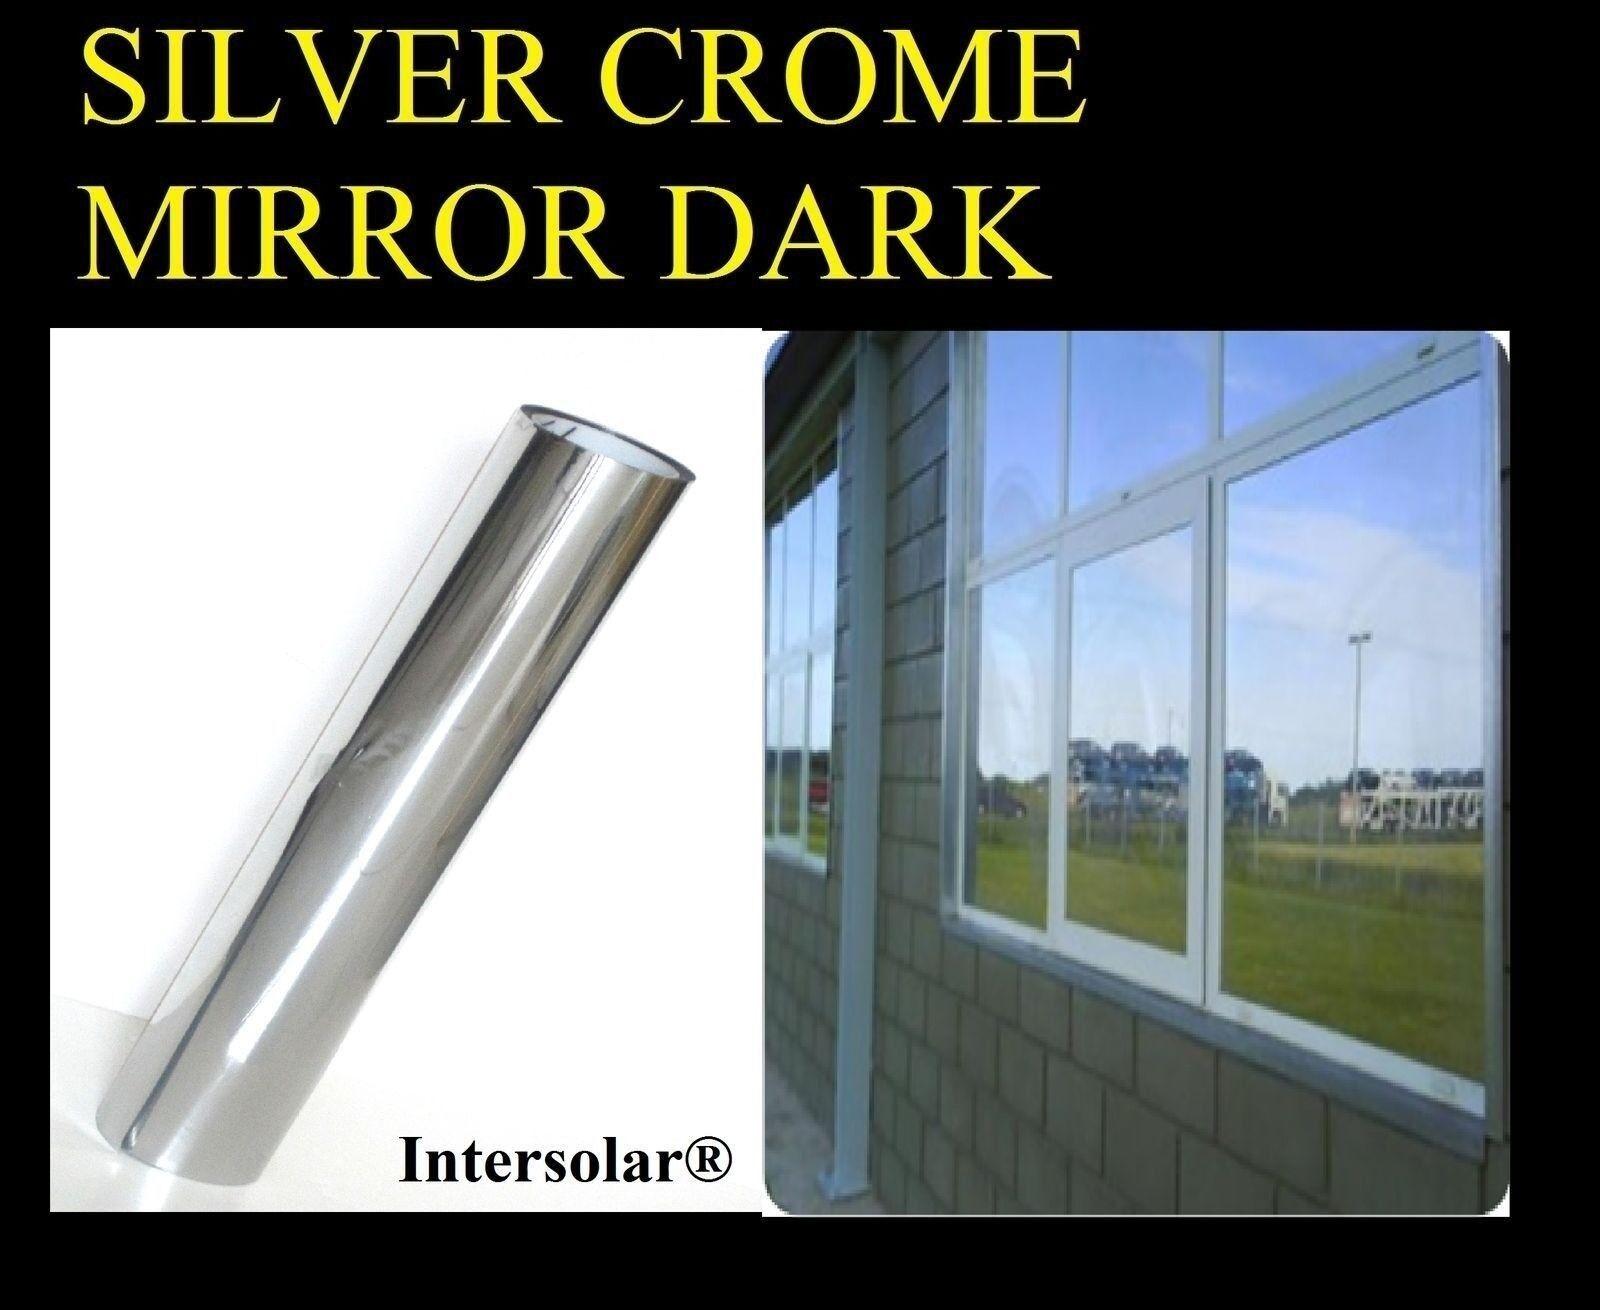 60 x15 Feet' Window Film  Mirror 90% Heat rossouccion  Intersolar®  5% Dark